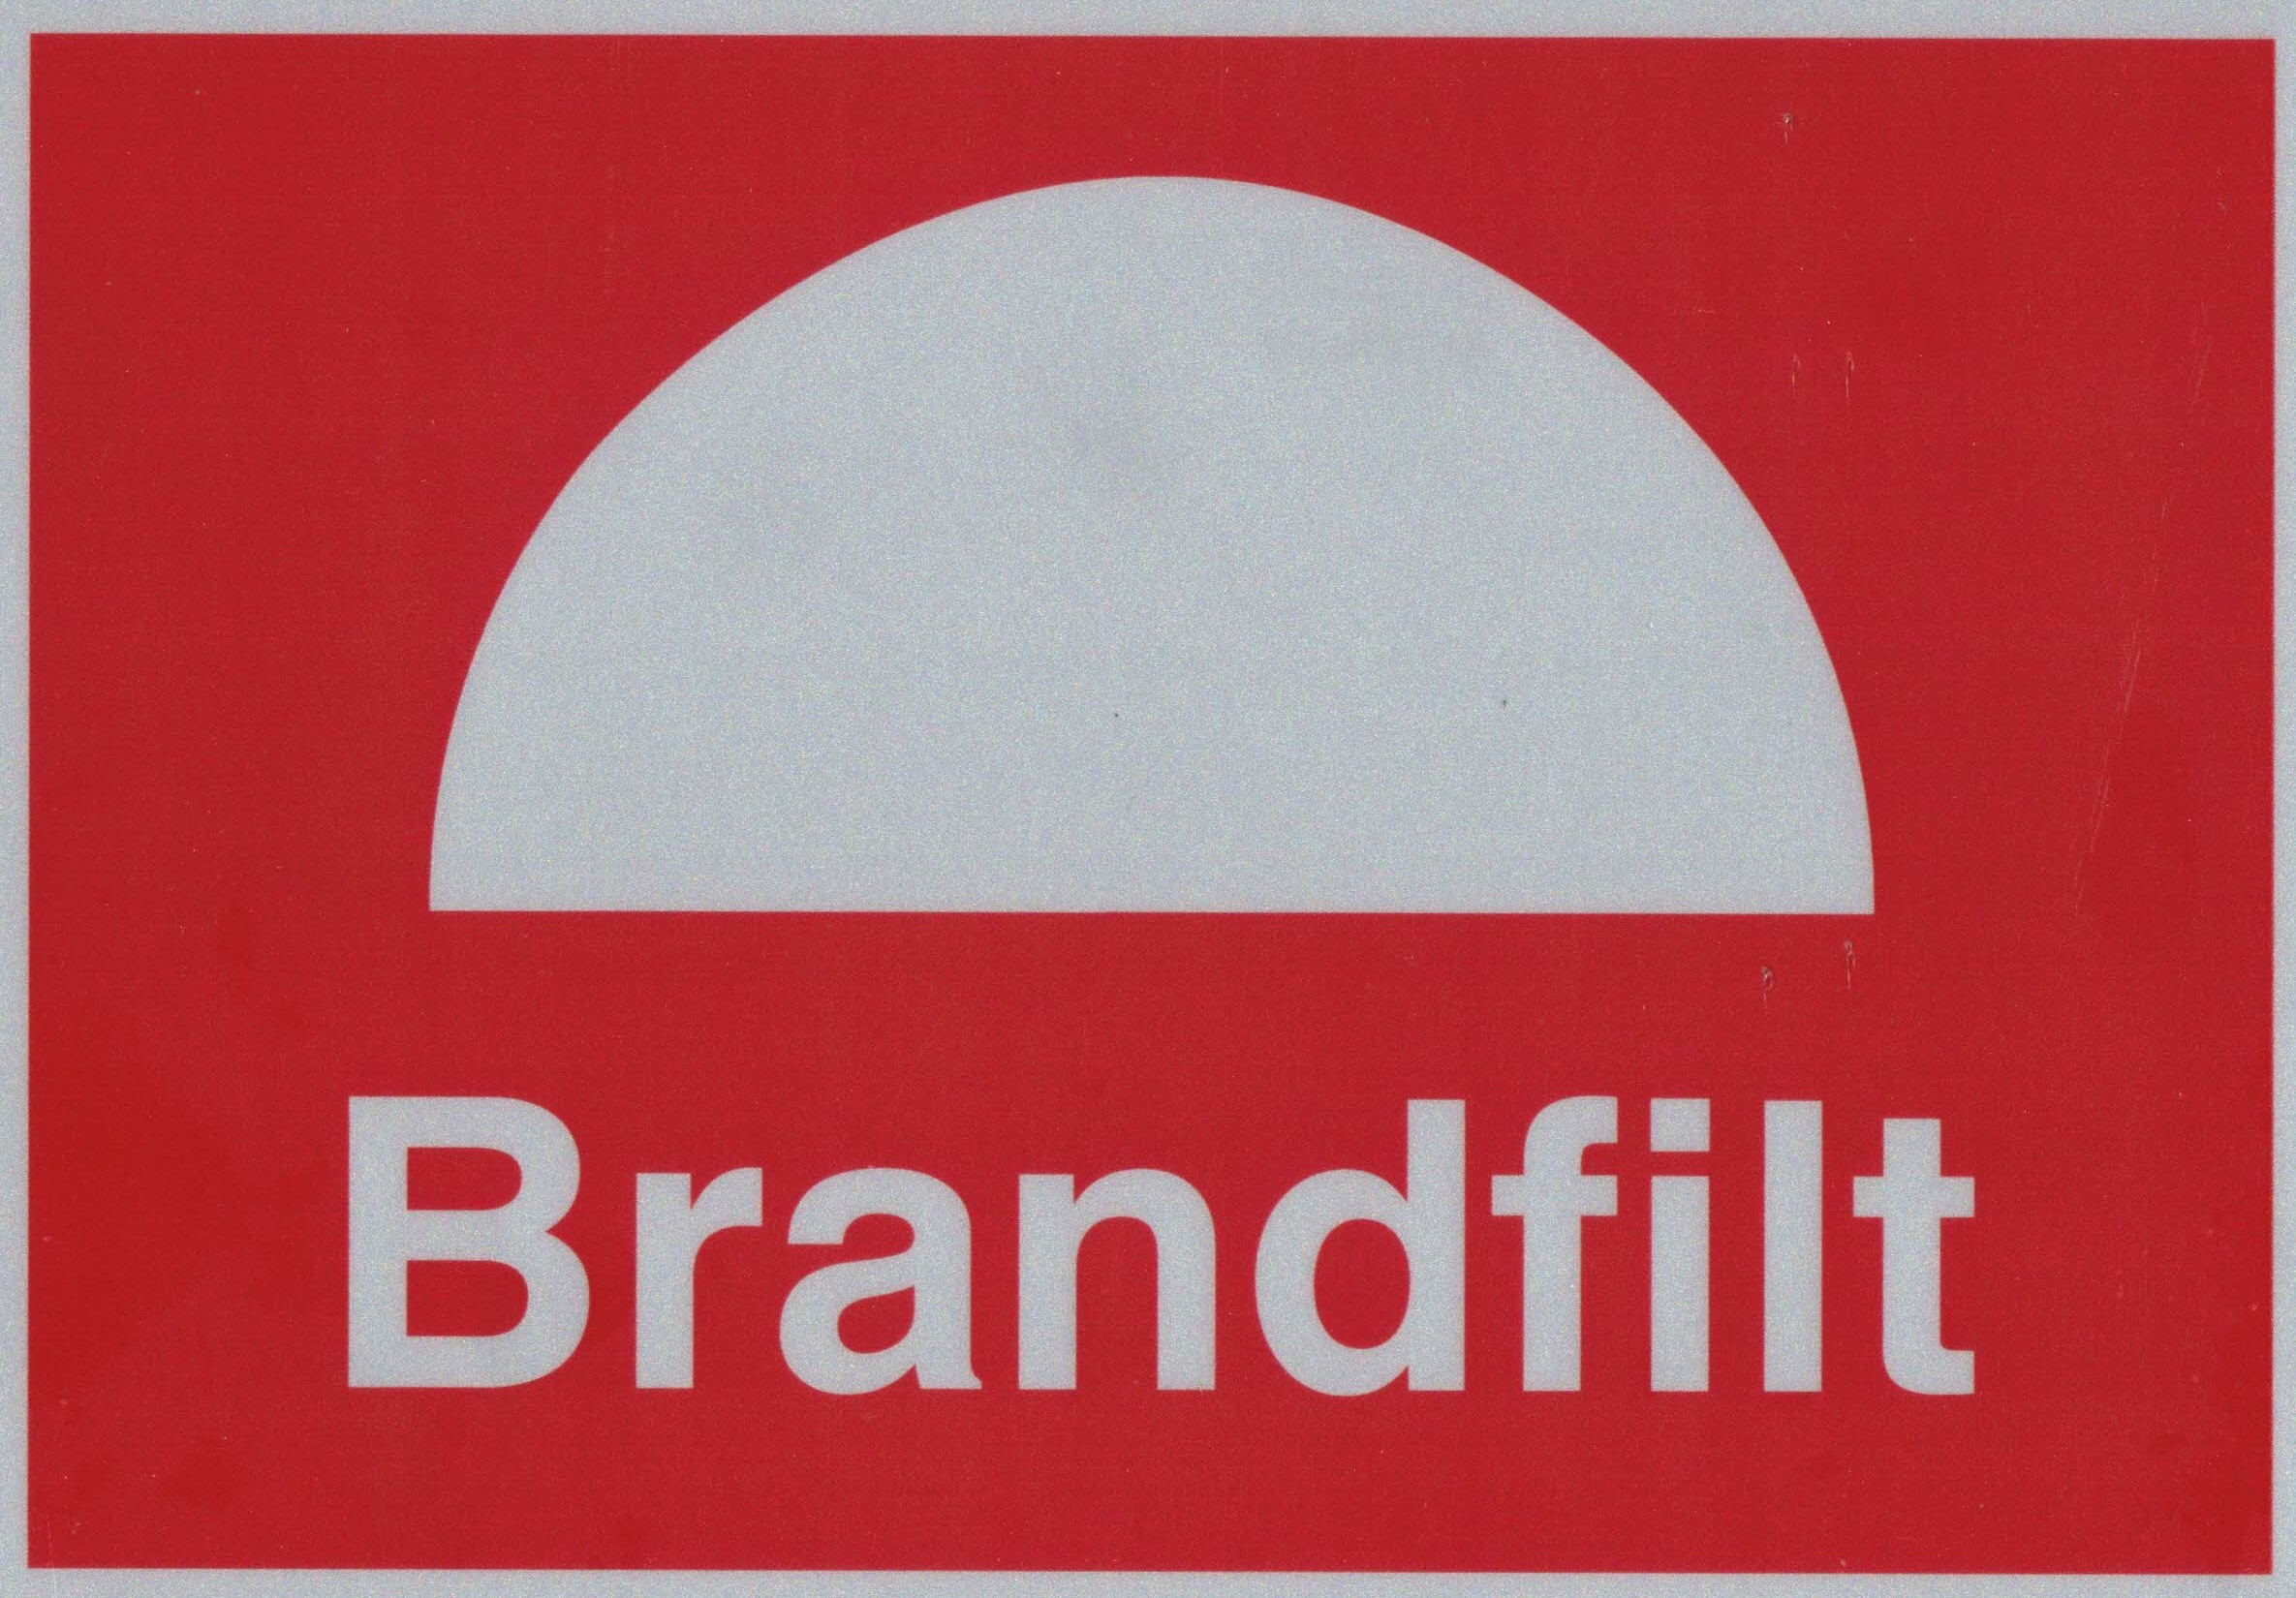 Brandfilt Alu A5_000006